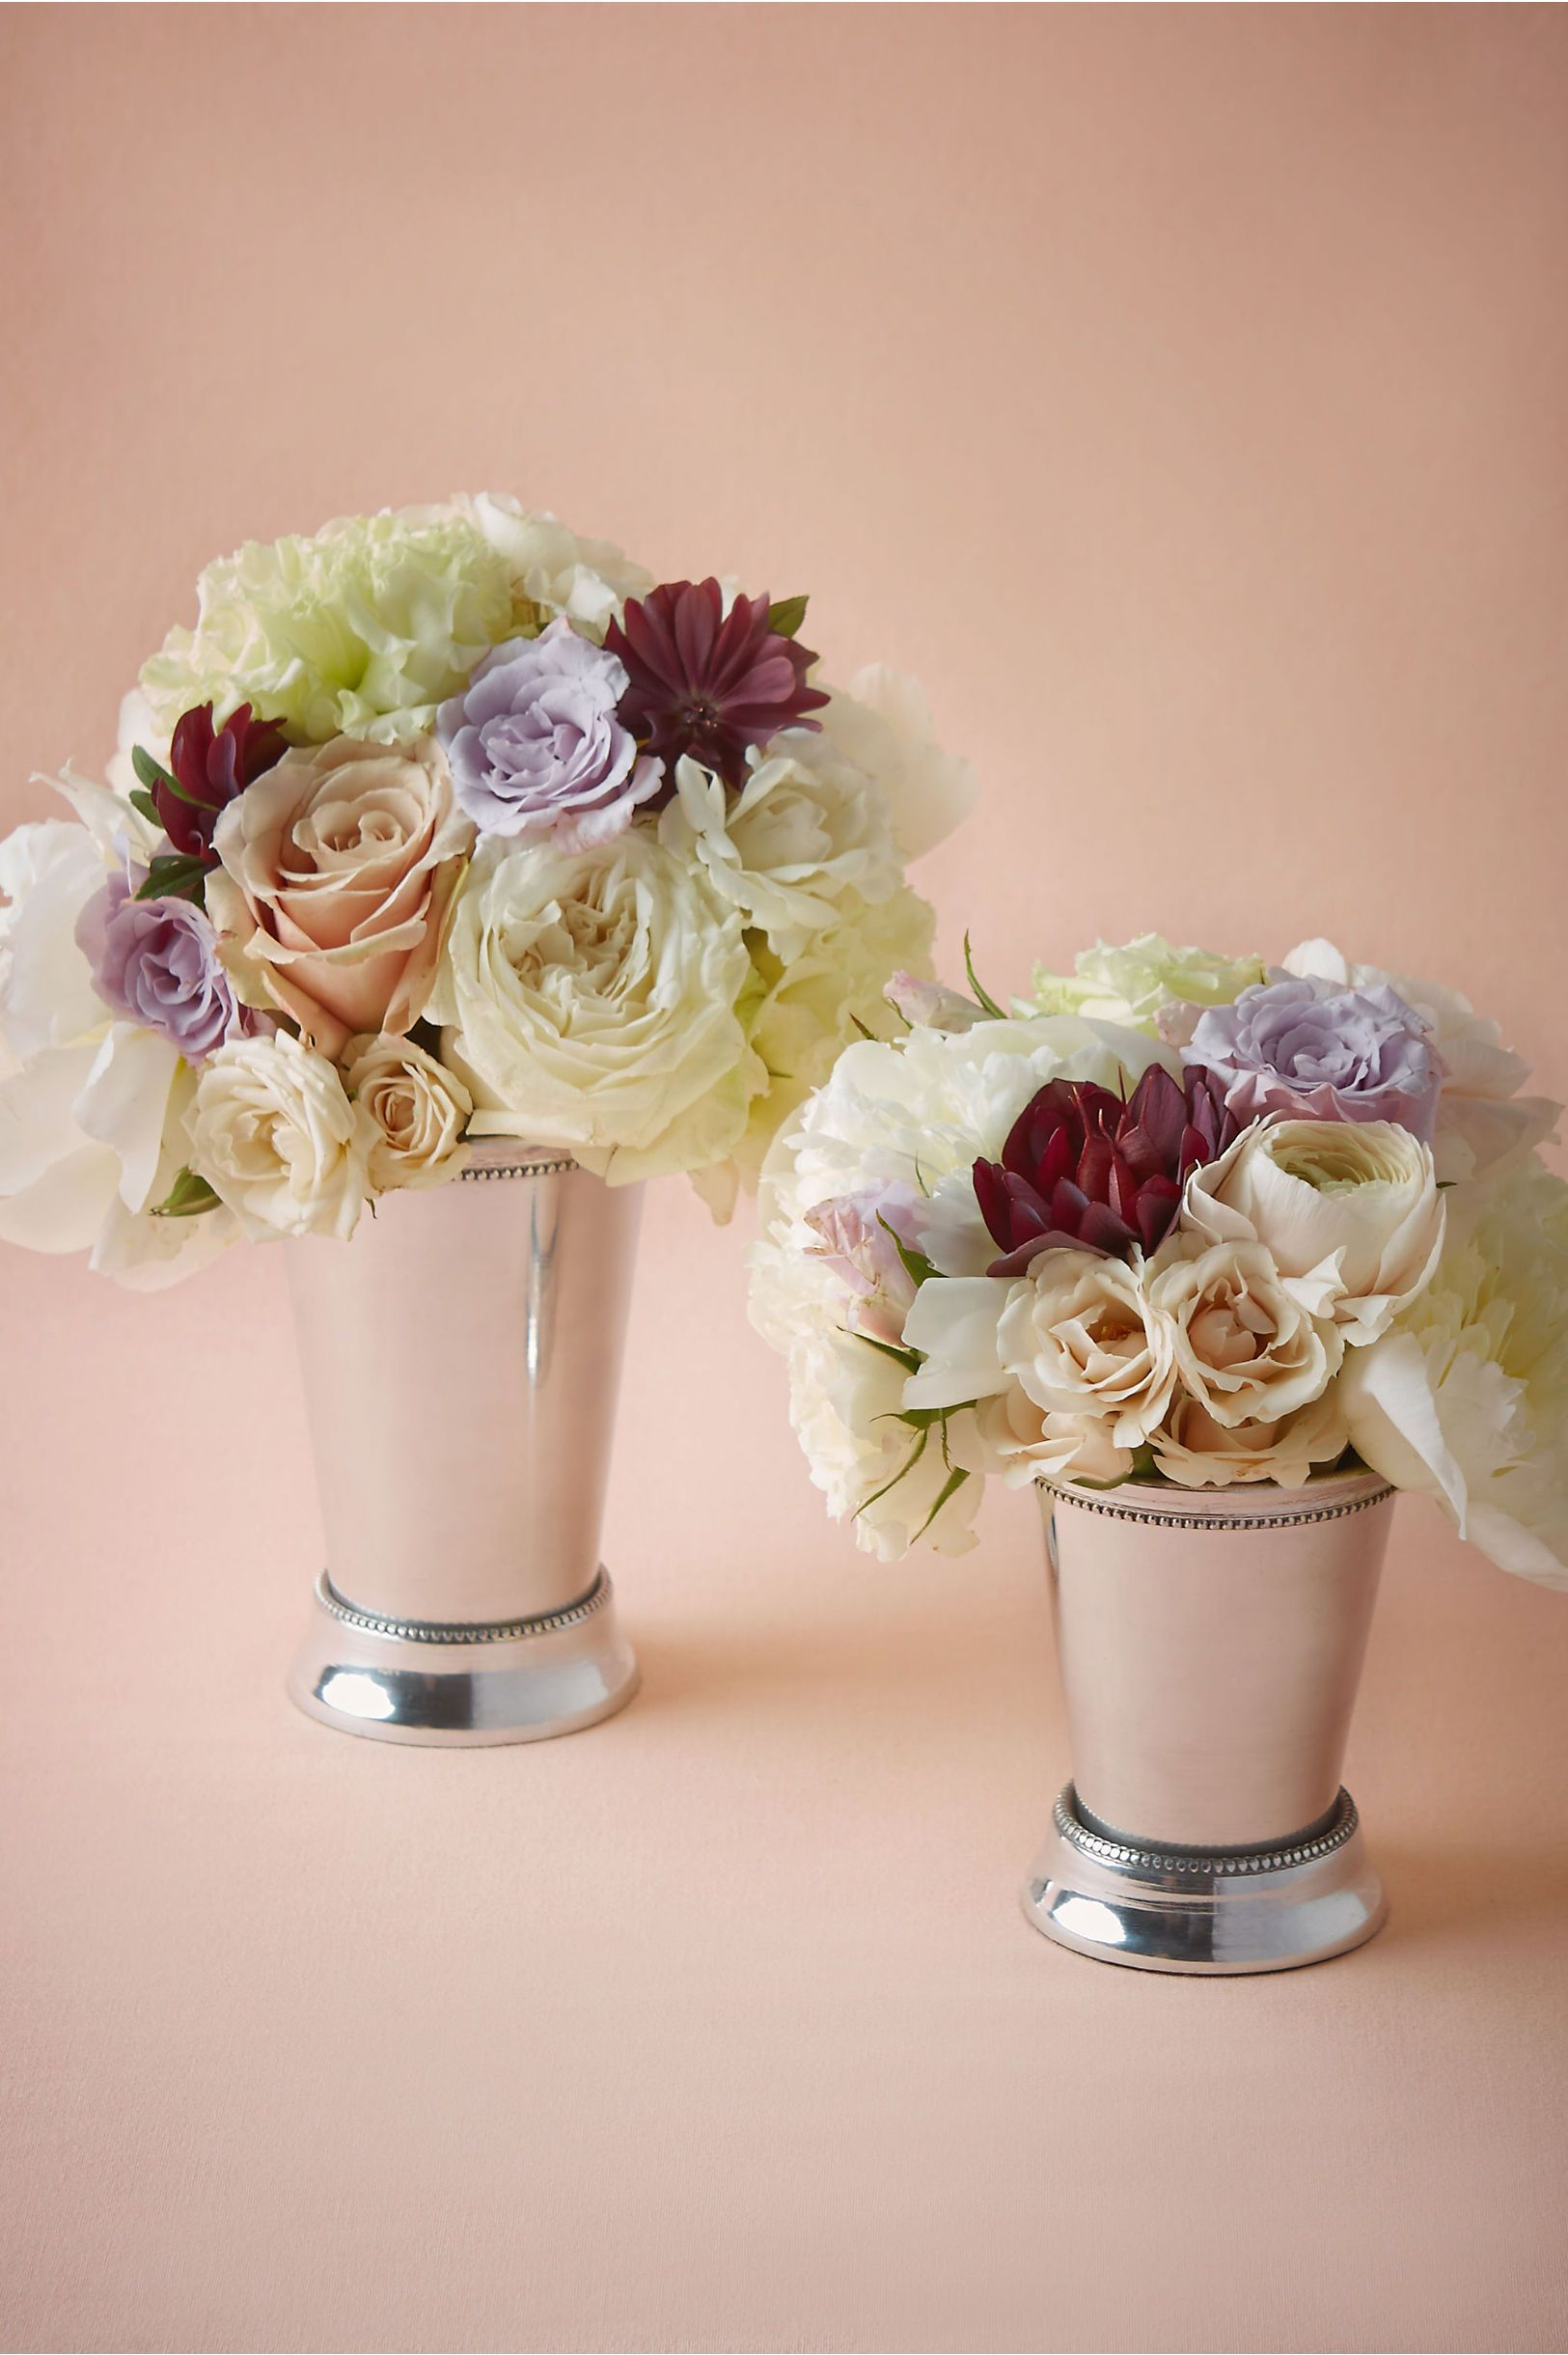 Small udH ud diameter Medium udH ud diameter  Wedding